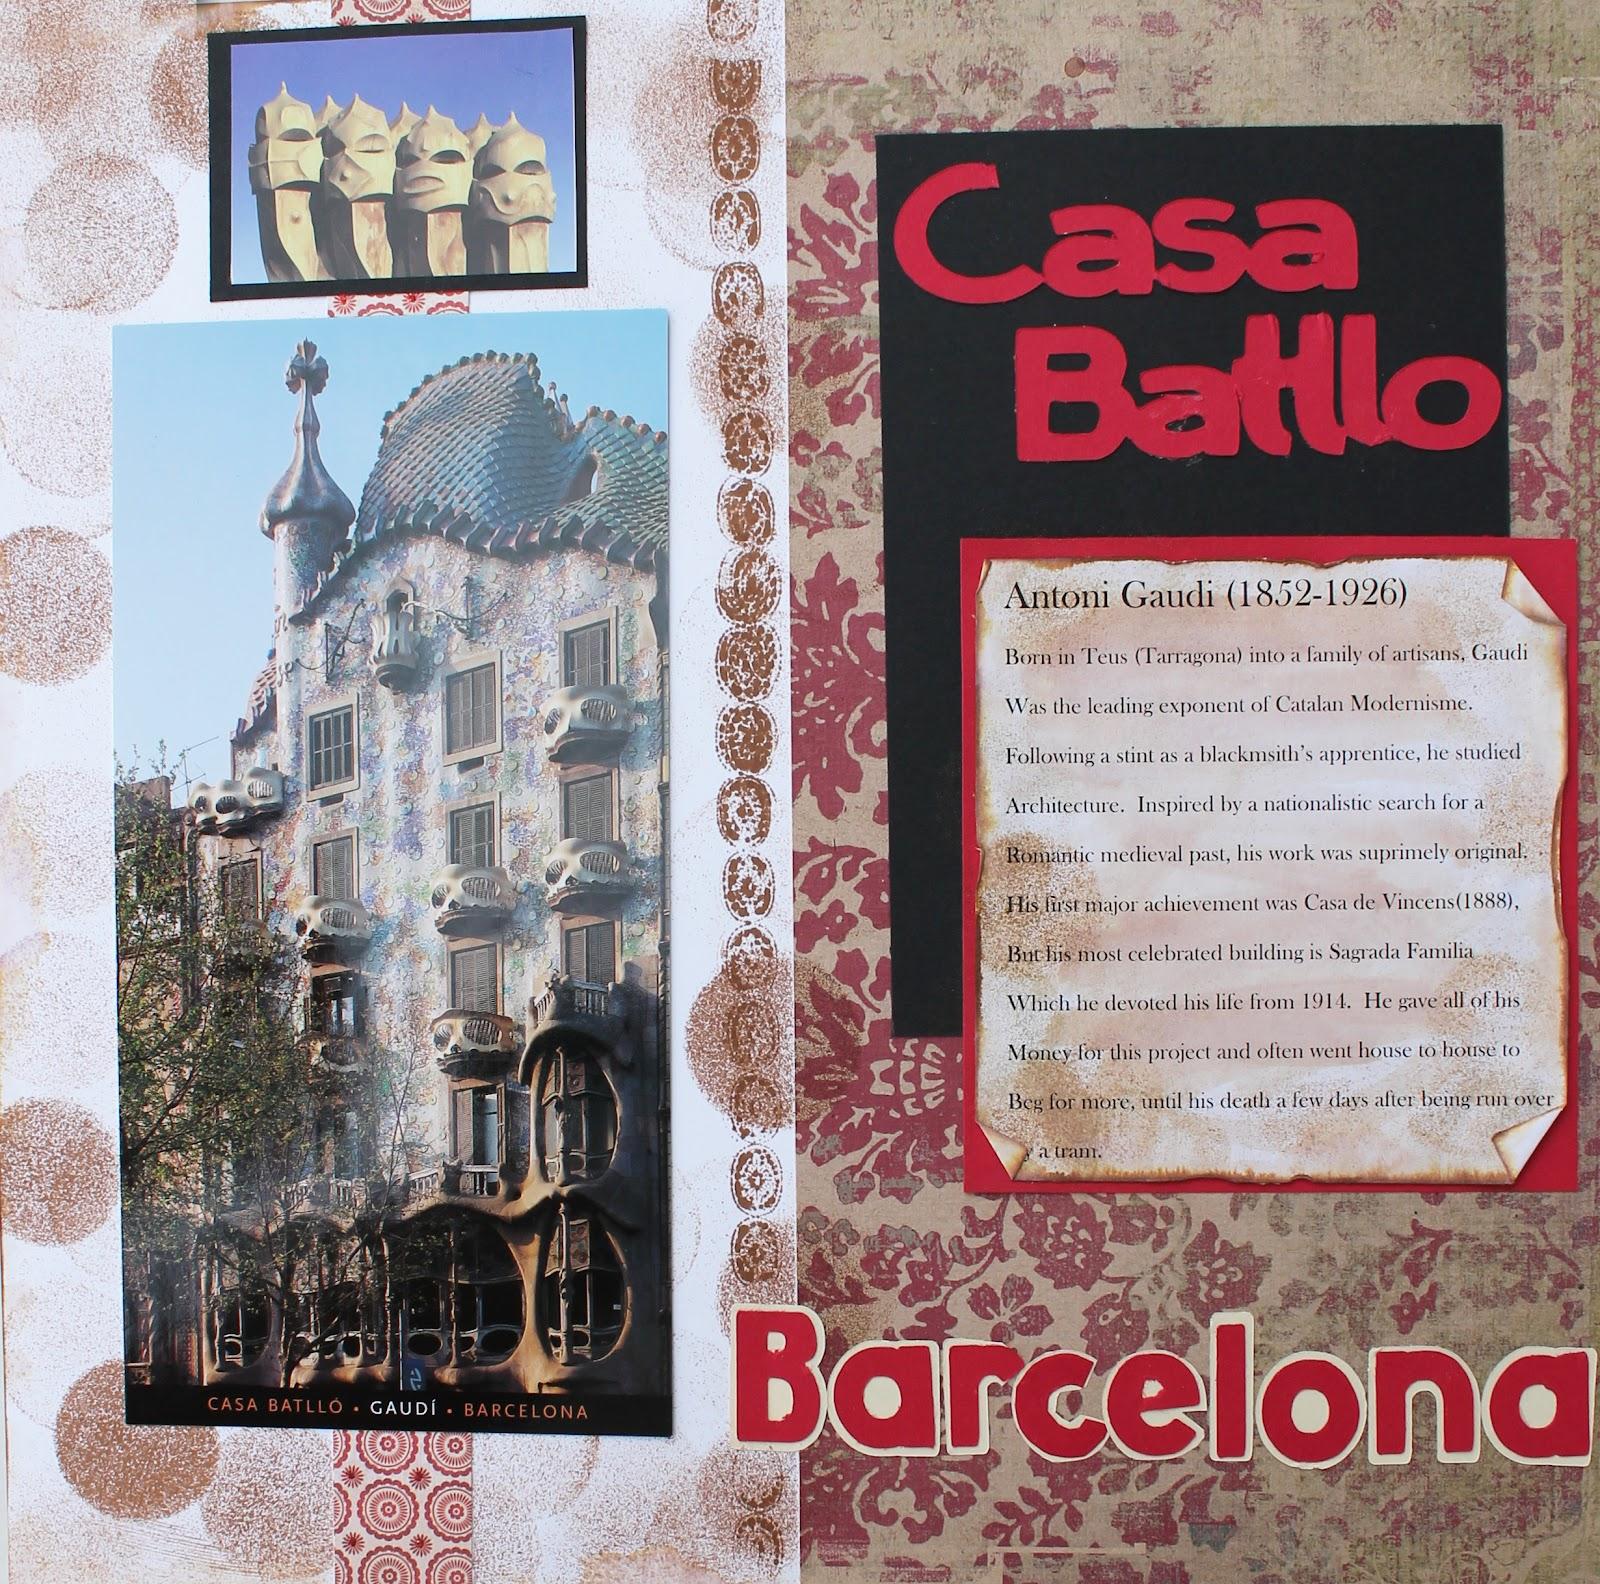 Travel scrapbook ideas - Spain Travel Scrapbook Pages Barcelona